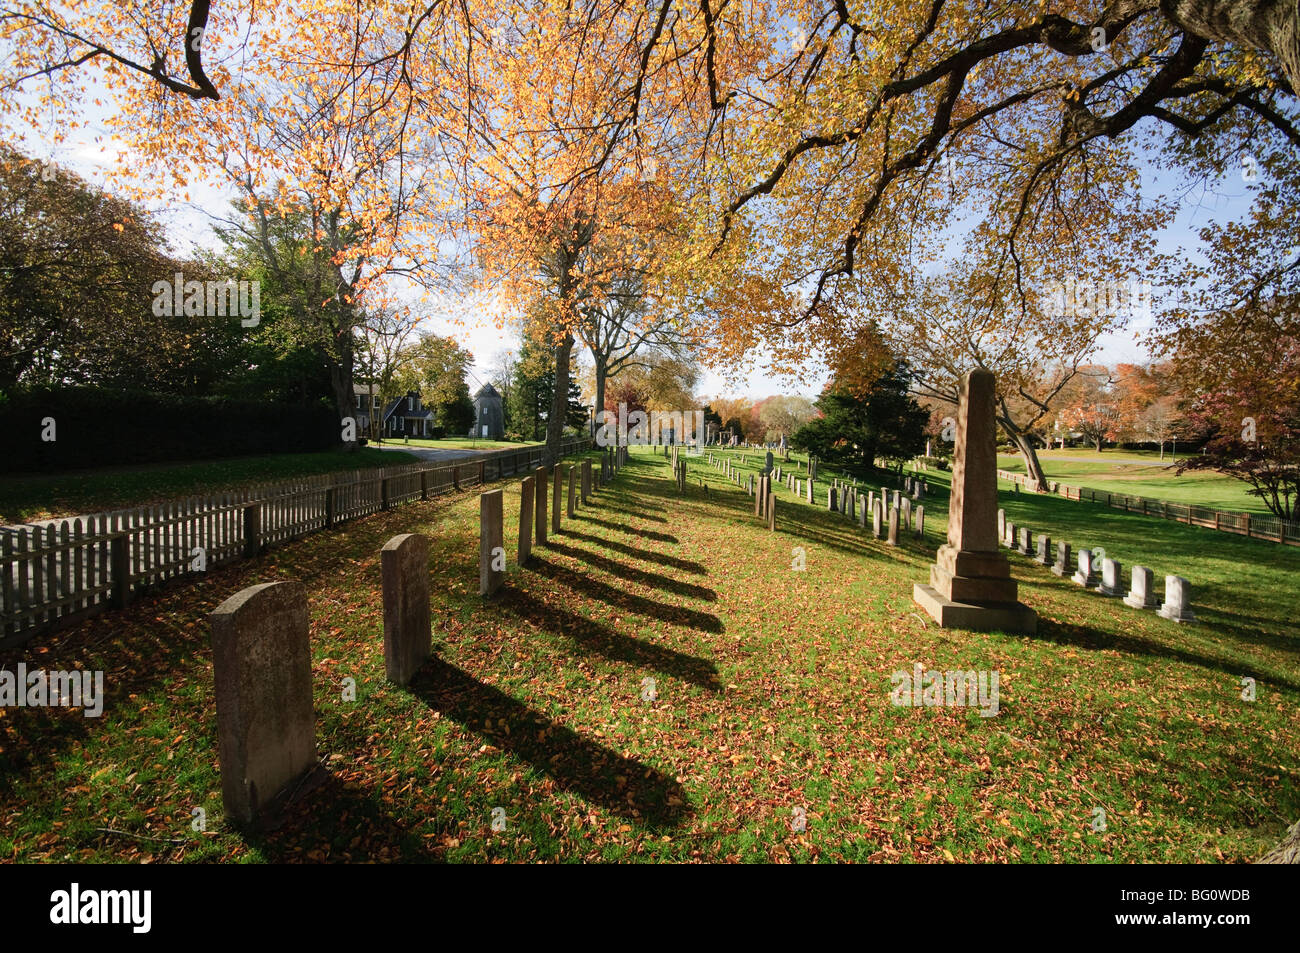 Cemetery, East Hampton, The Hamptons, Long Island, New York State, United States of America, North America Stock Photo